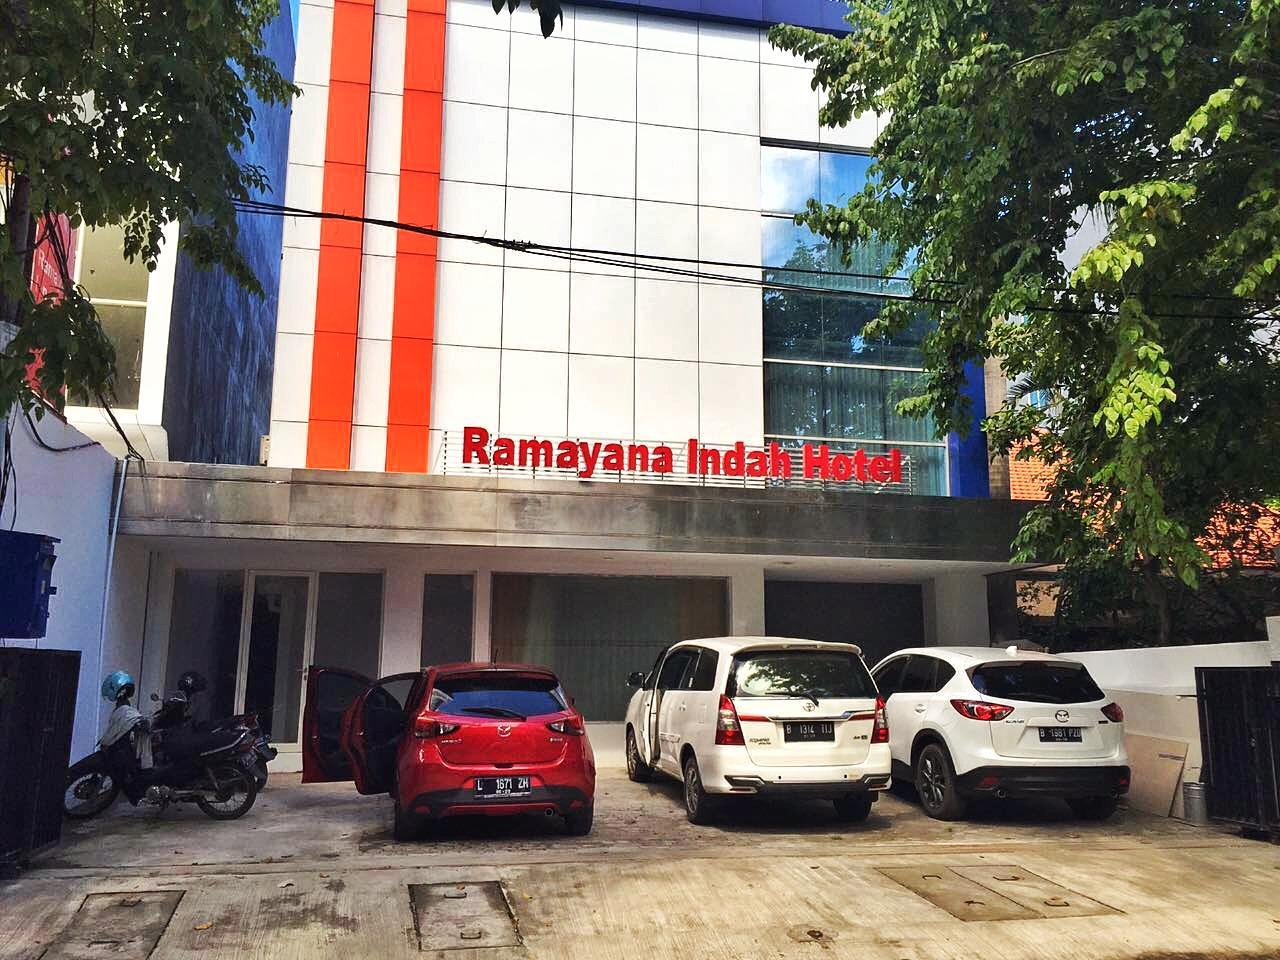 Ramayana Indah Hotel Pusat Surabaya Surabaya Mulai Dari Rp